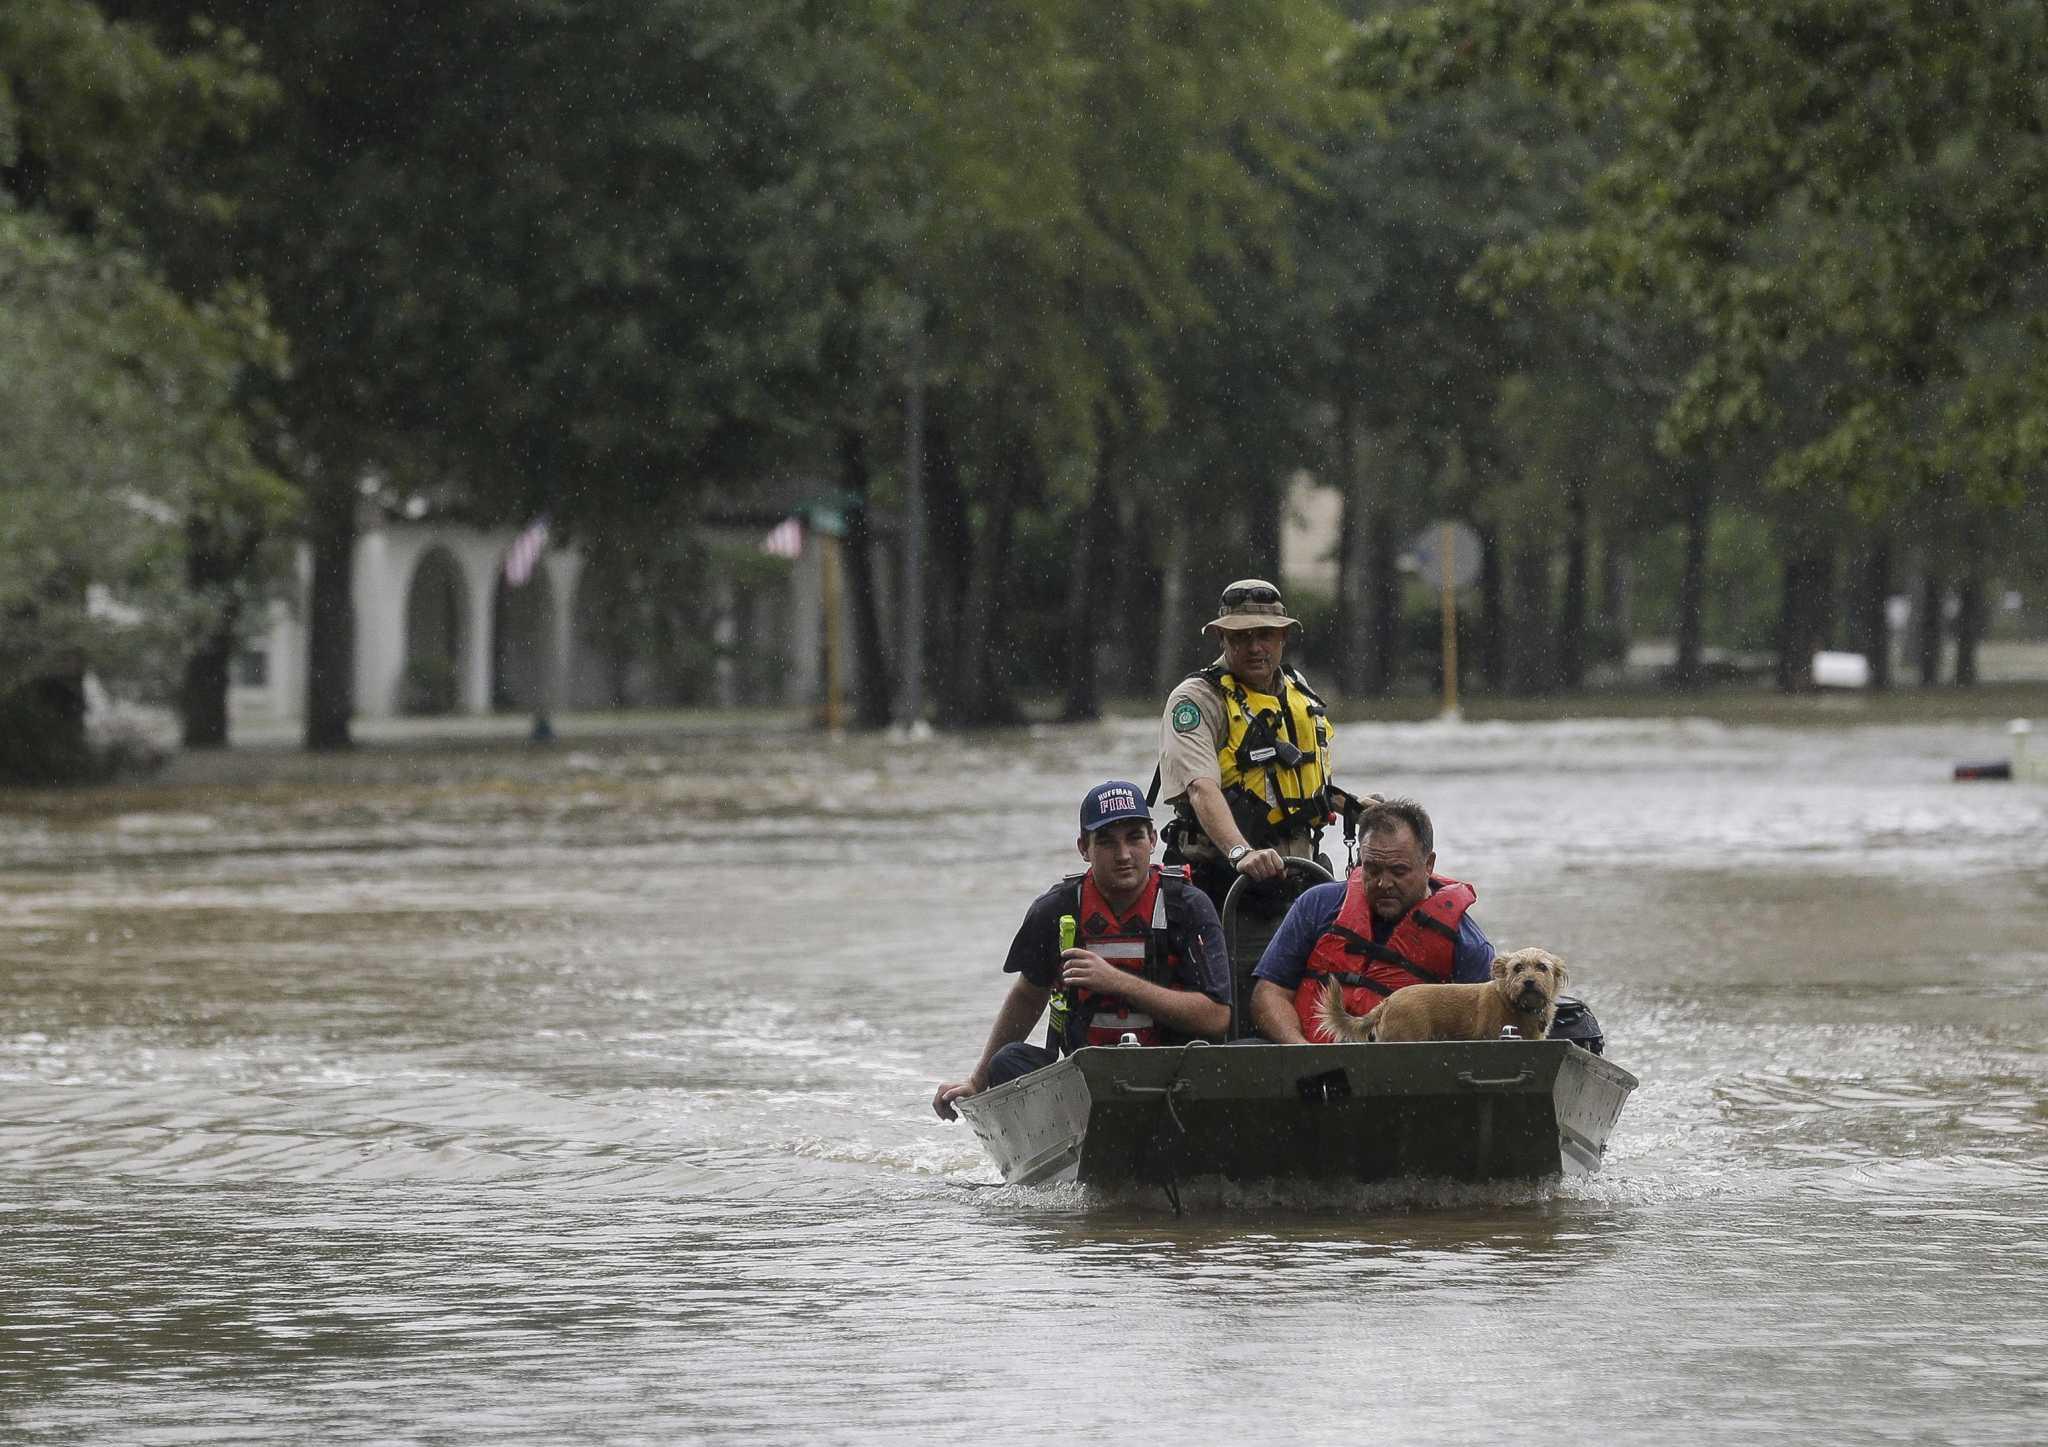 In wake of Imelda, Harris County to aggressively pursue floodplain violators